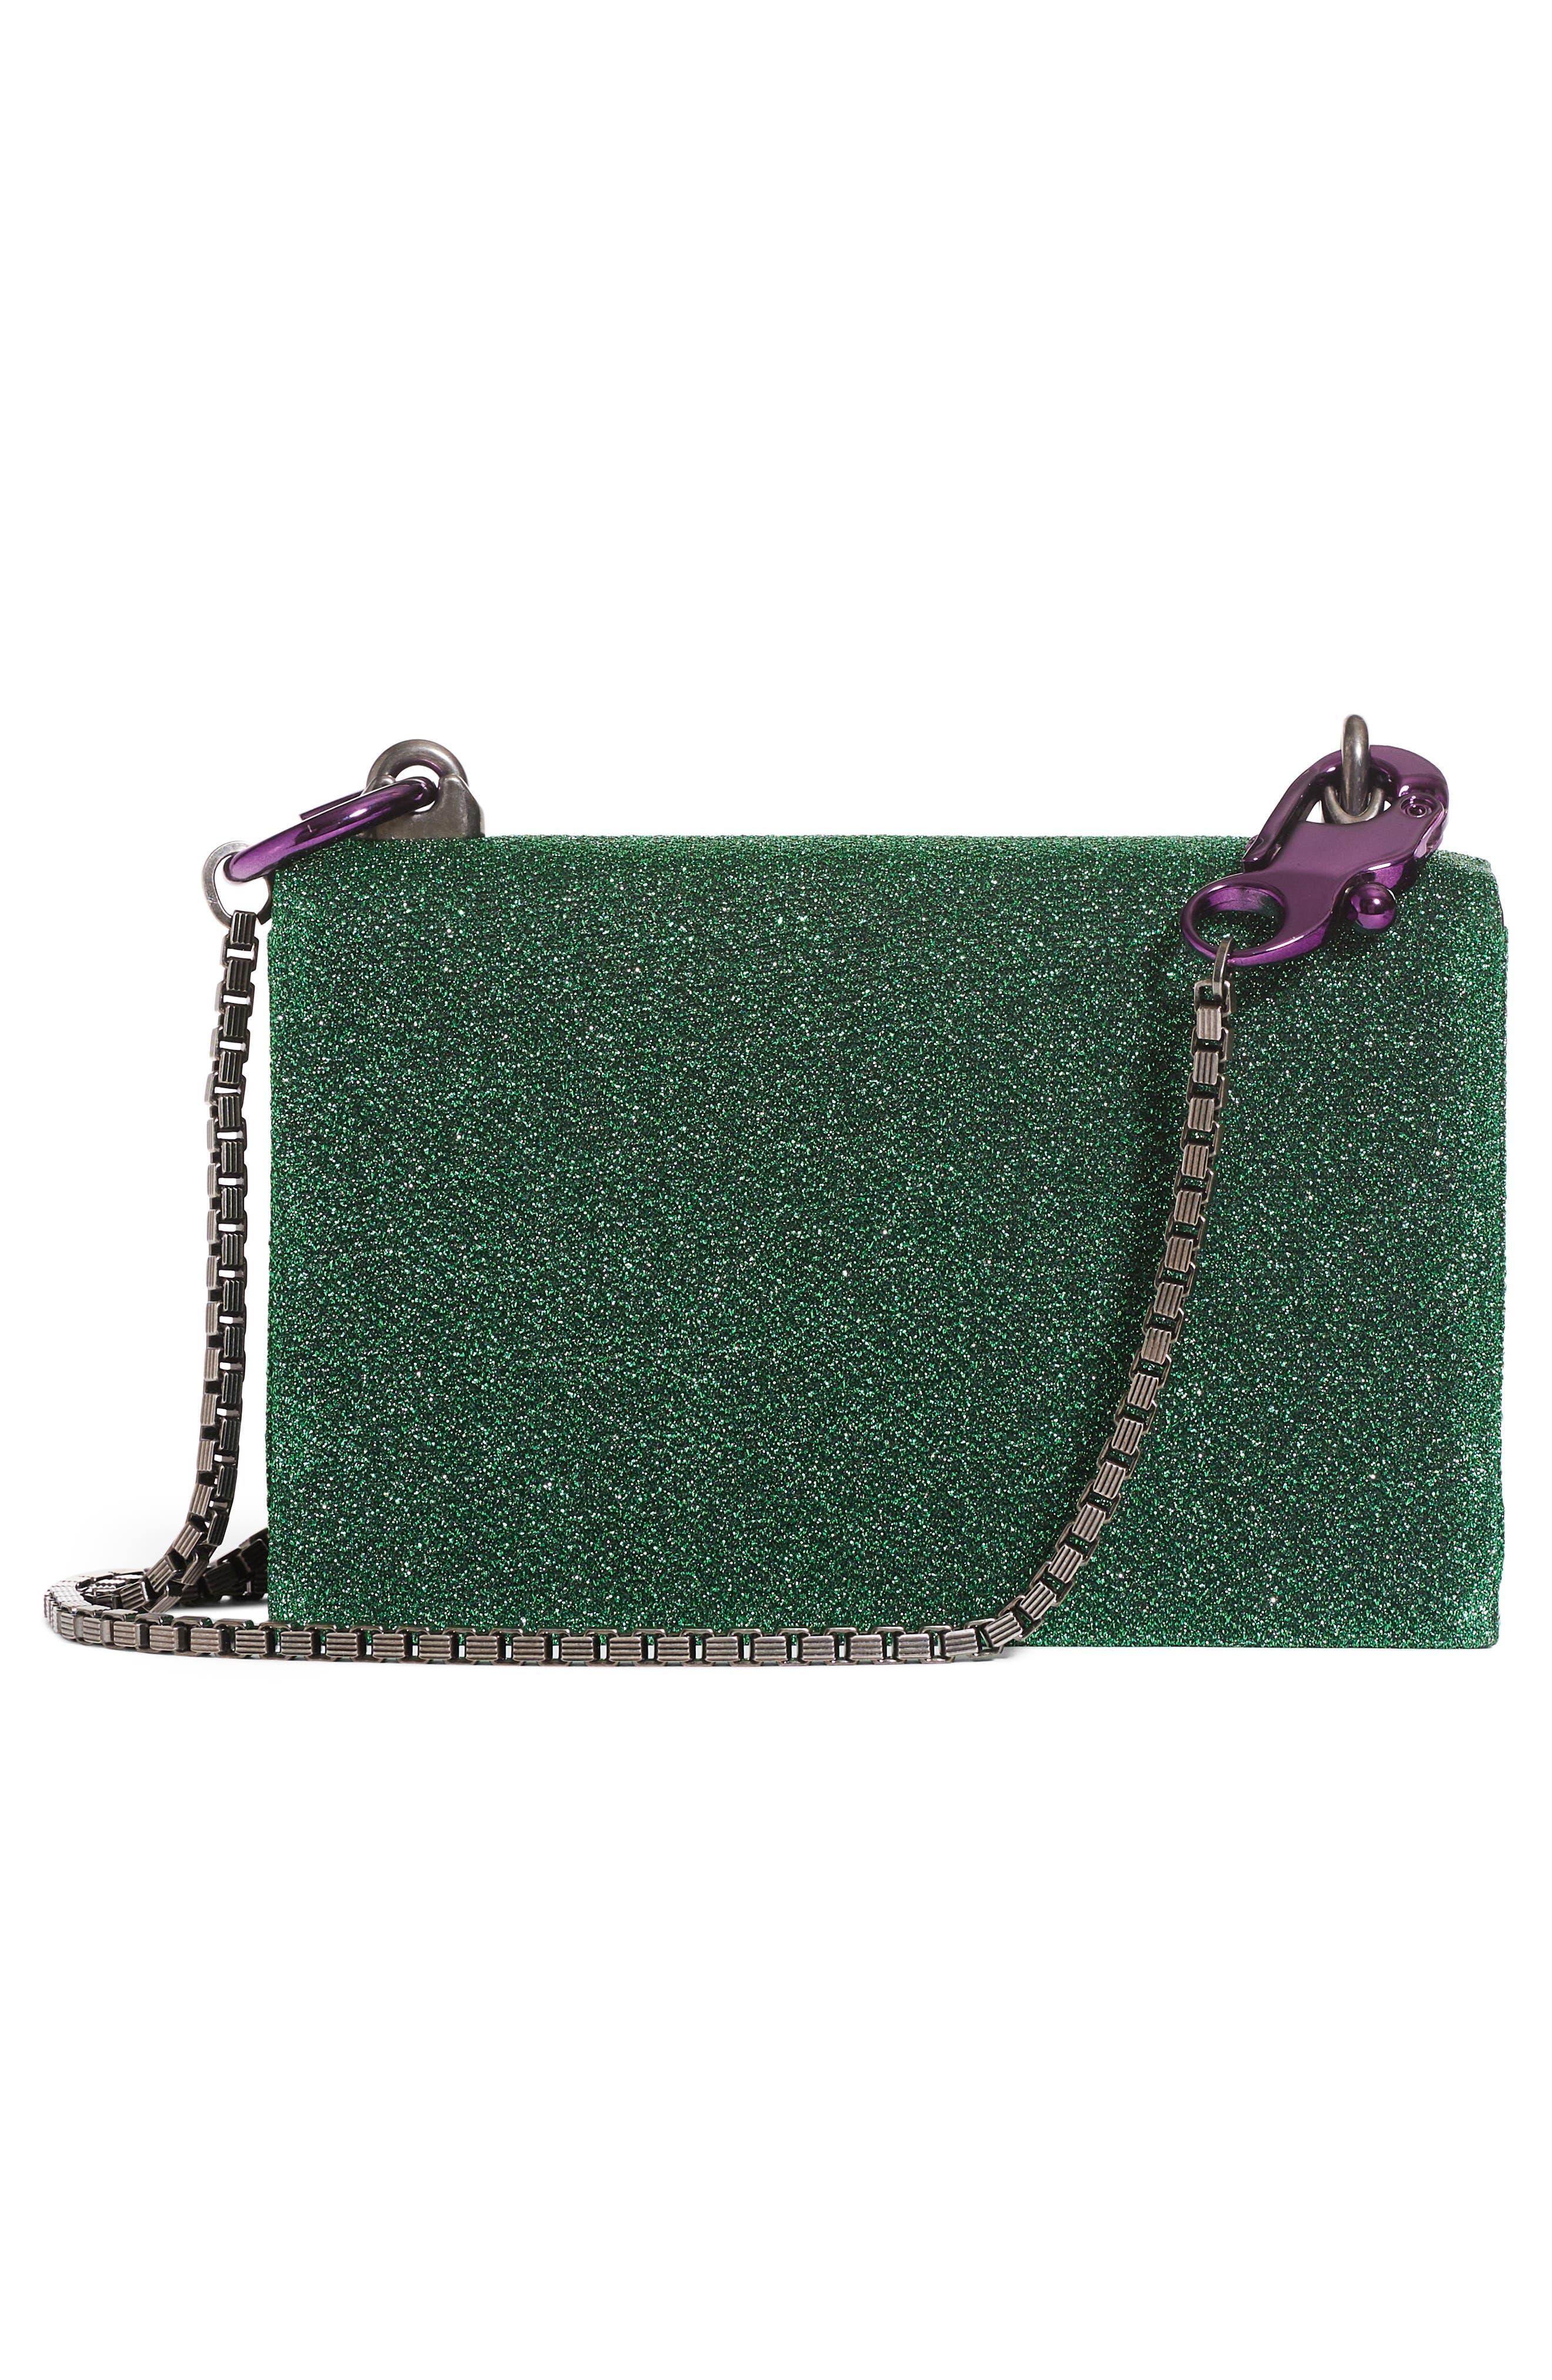 DG Girls Metallic Shoulder Bag,                             Alternate thumbnail 6, color,                             Green